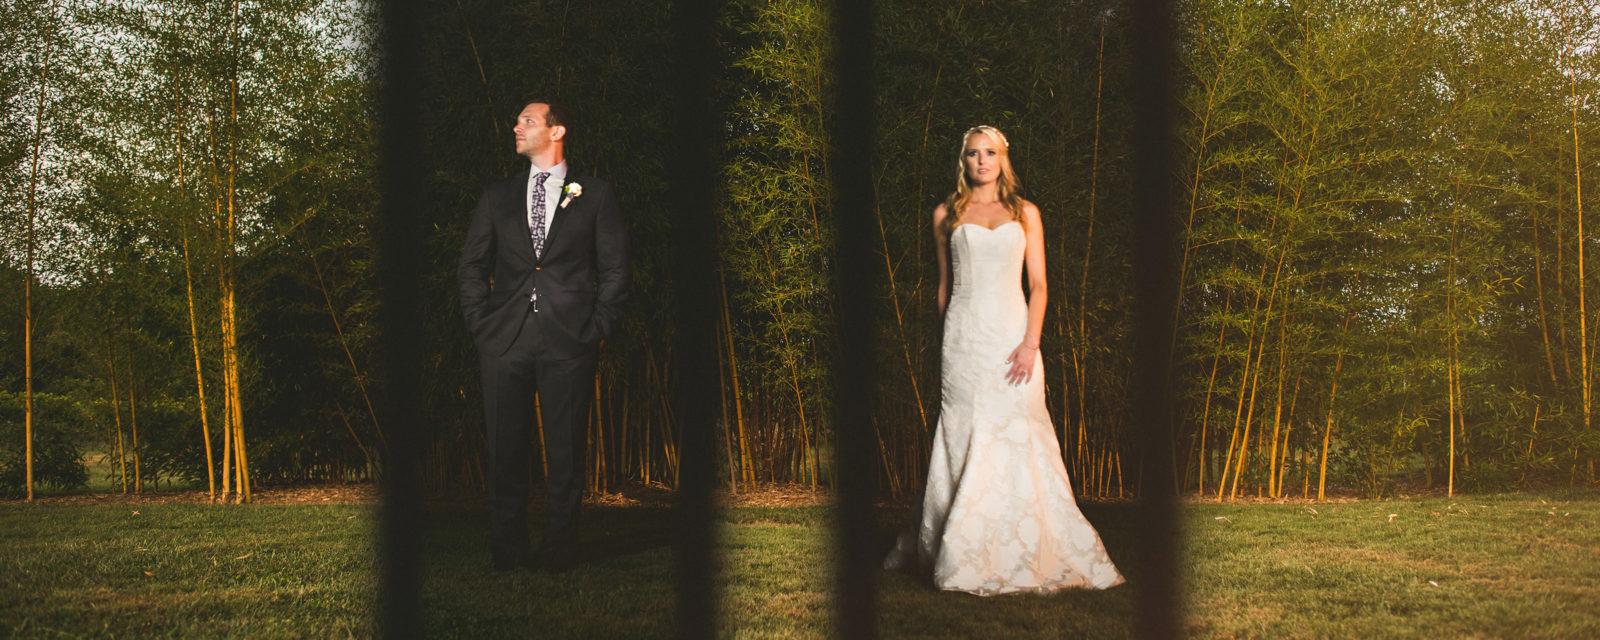 oliver + kathryn // keswick winery weddings